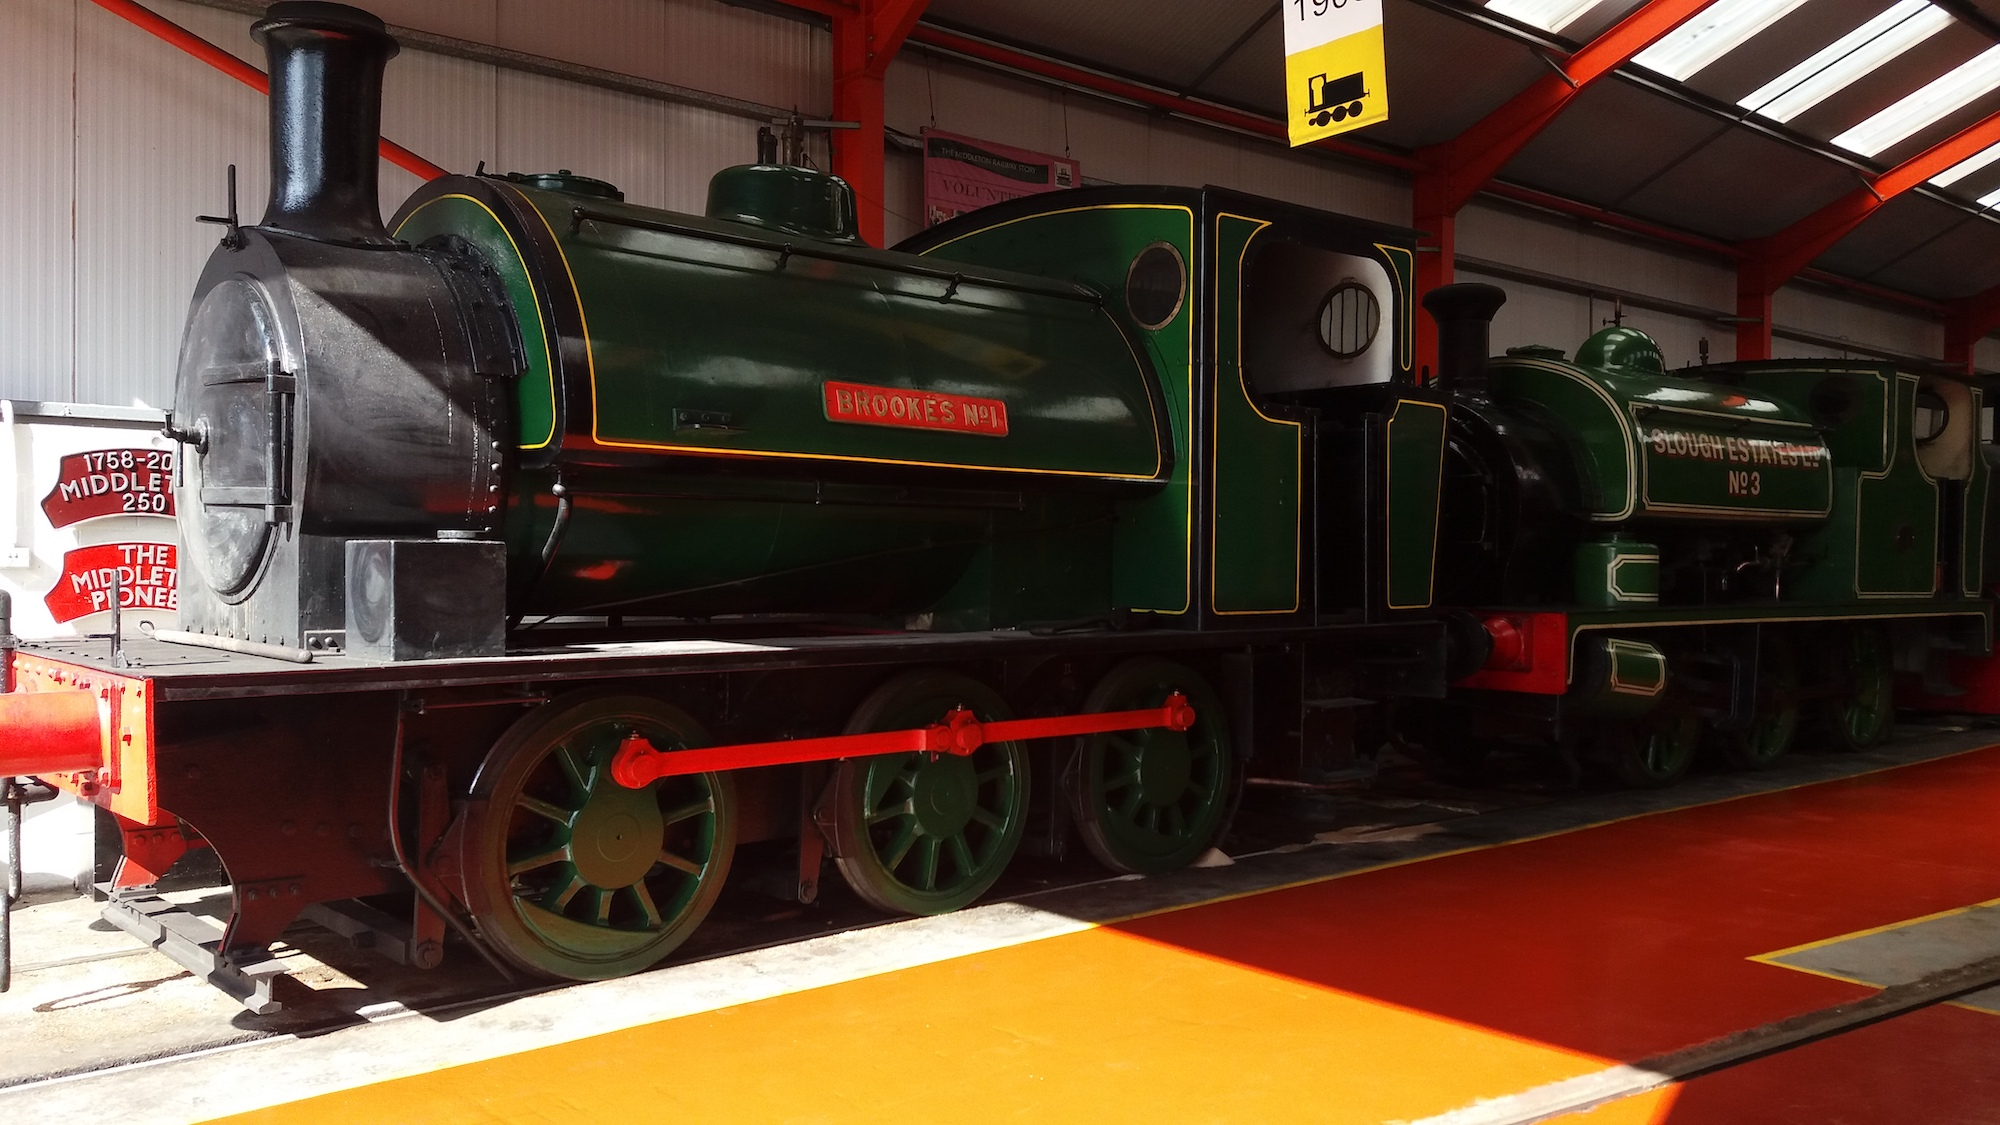 Middleton Railway Museum